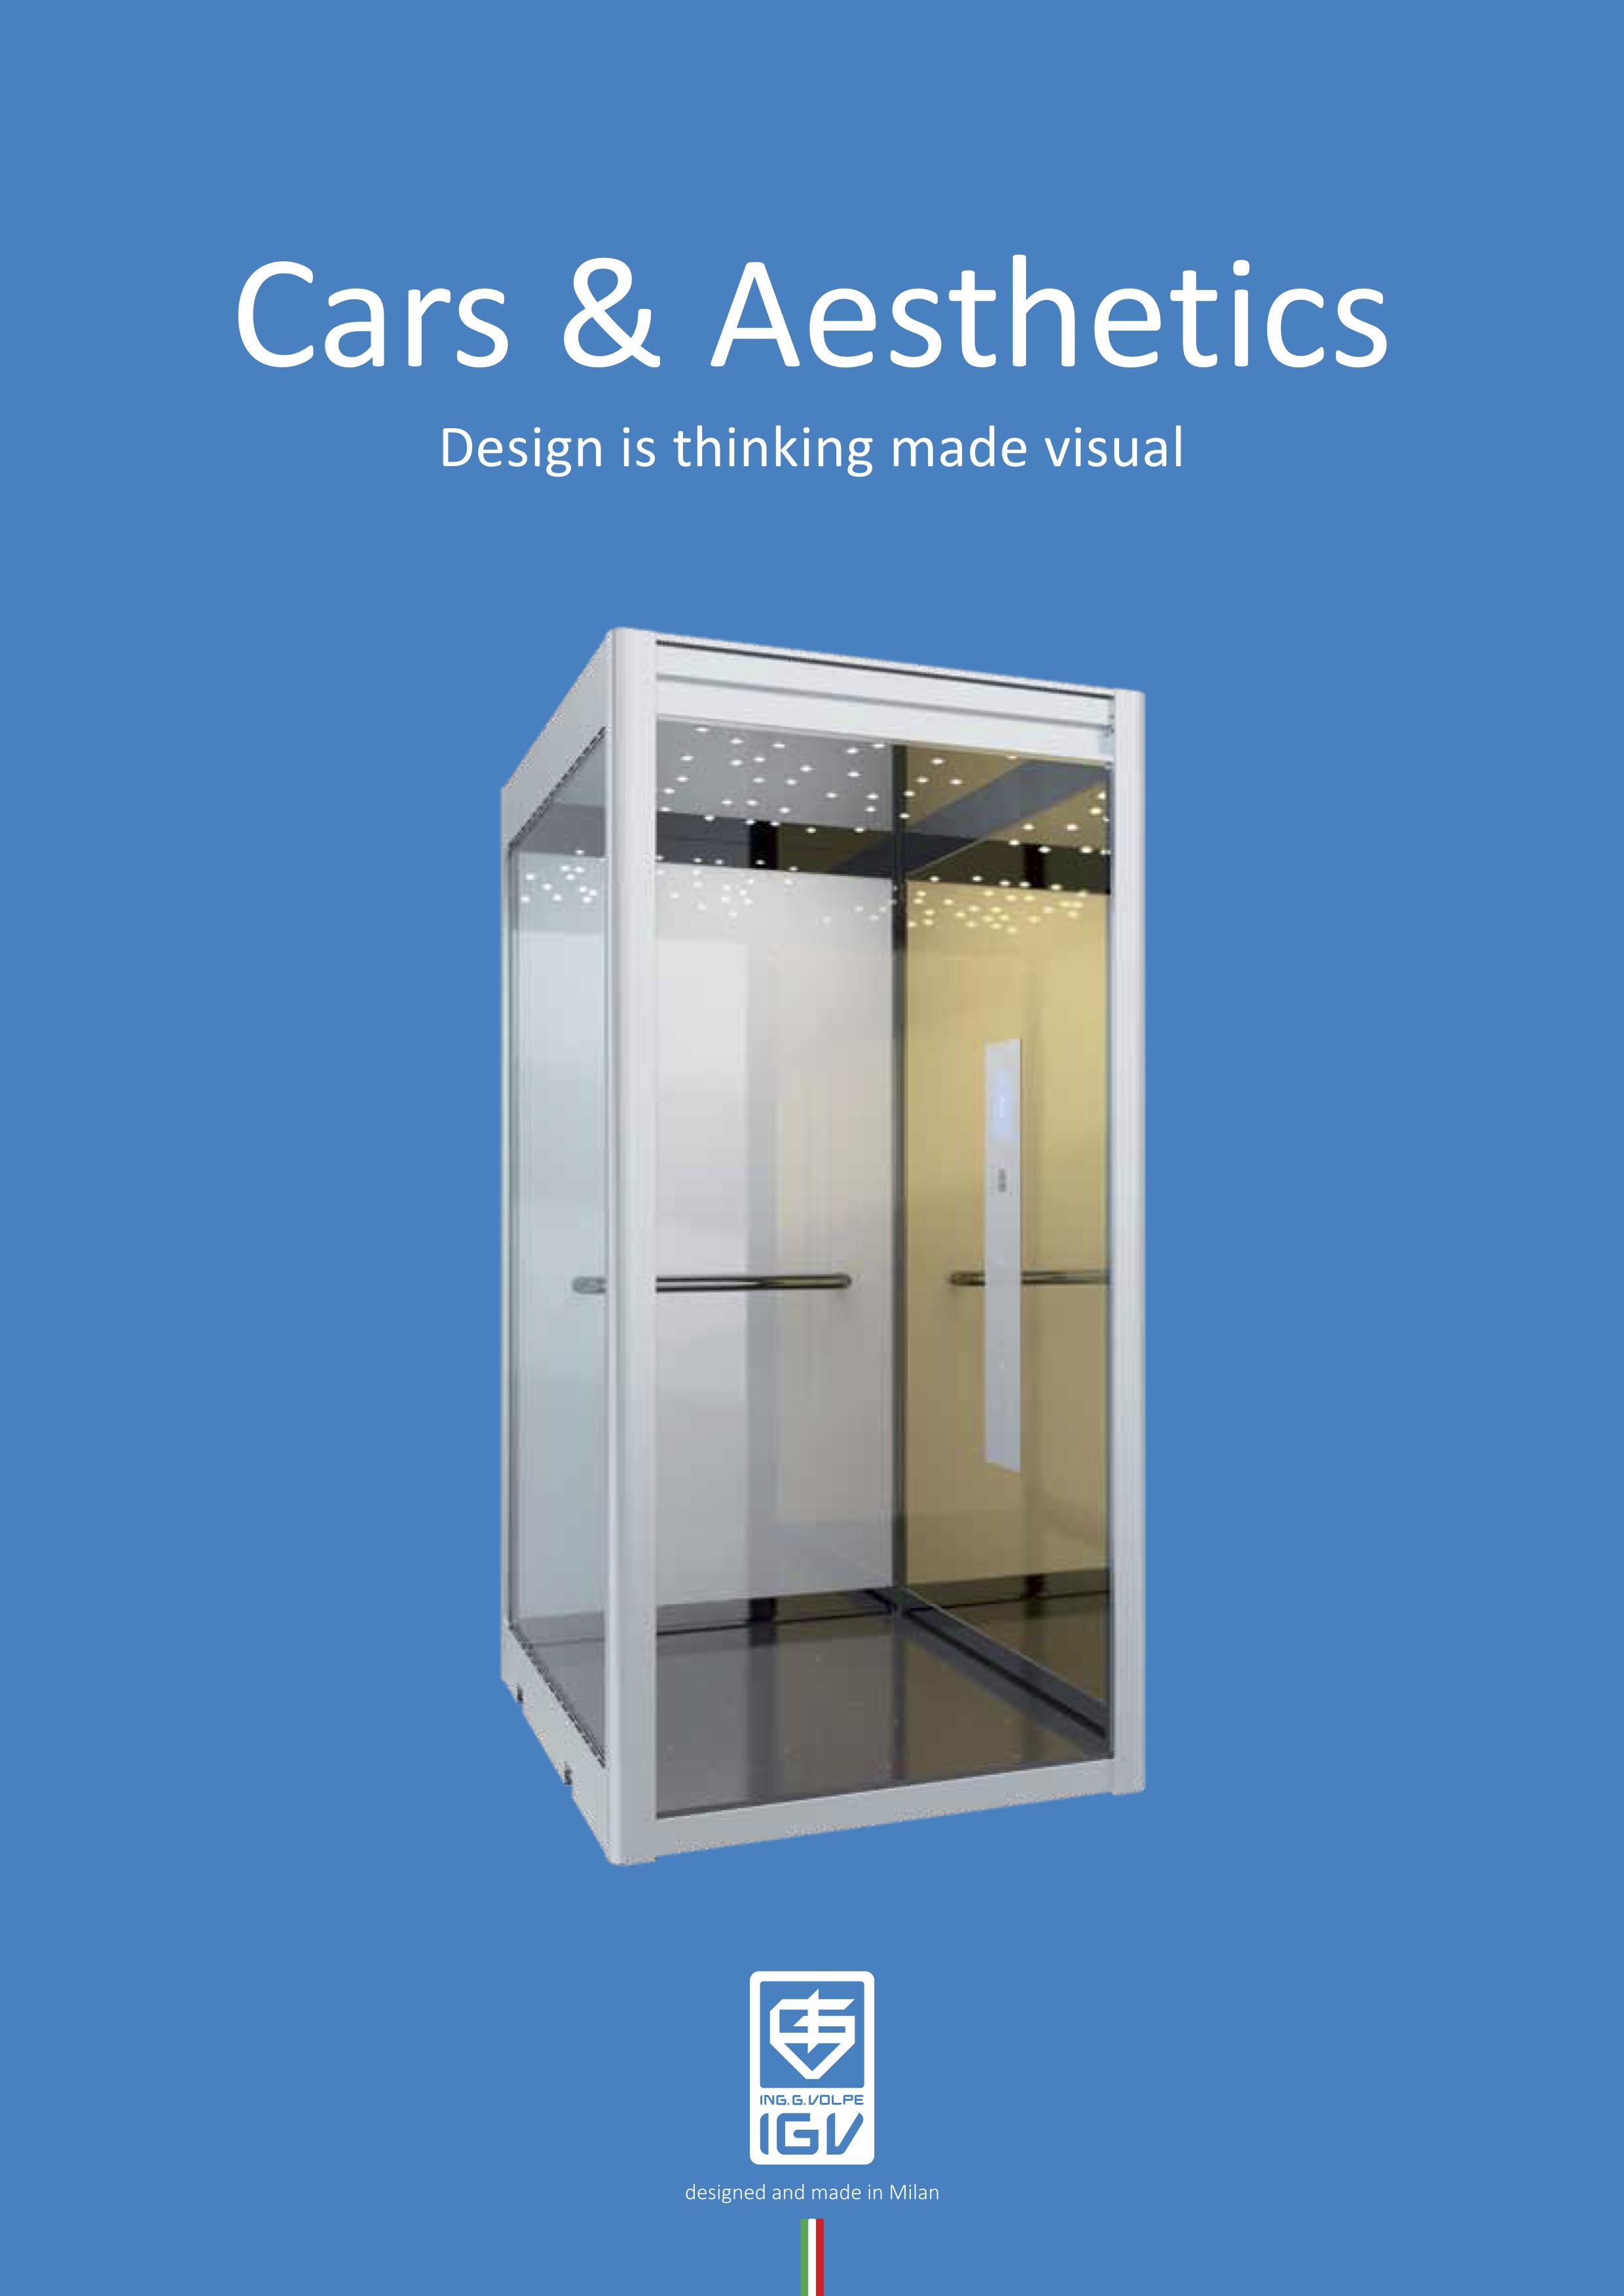 IGV-Cars-Aesthetics